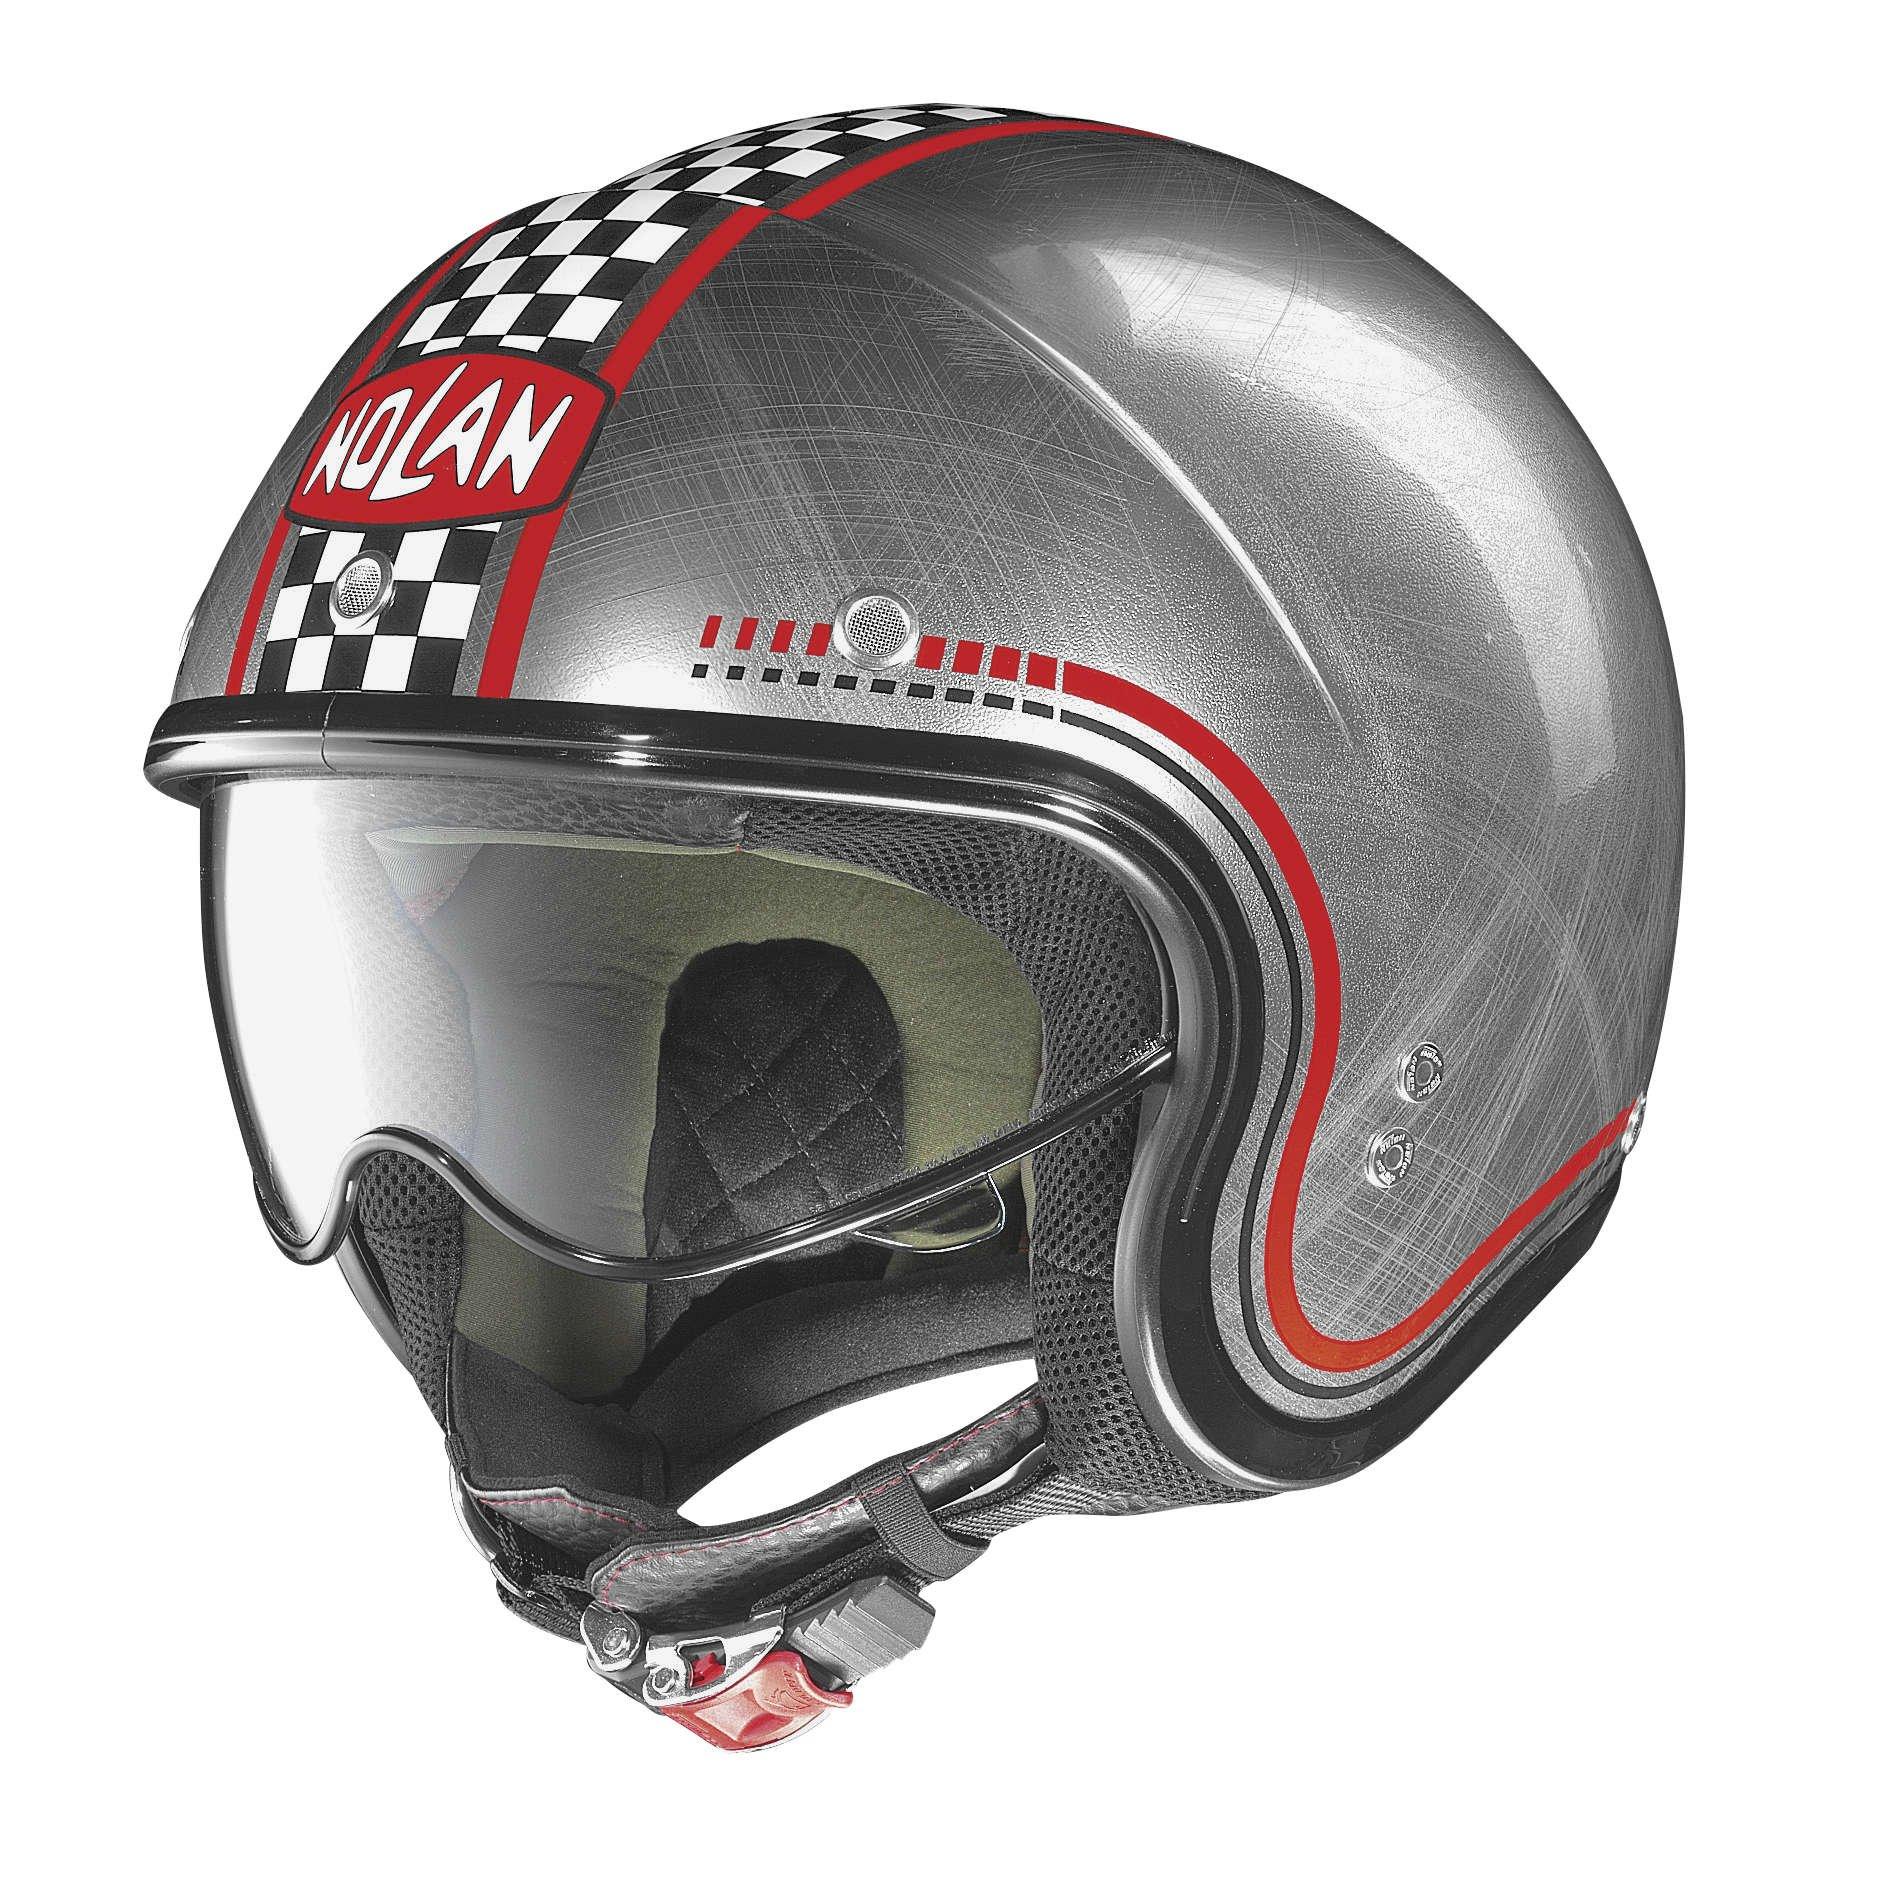 Nolan N21 Lario Scratched Chrome Checker Open Face Helmet, M by Nolan